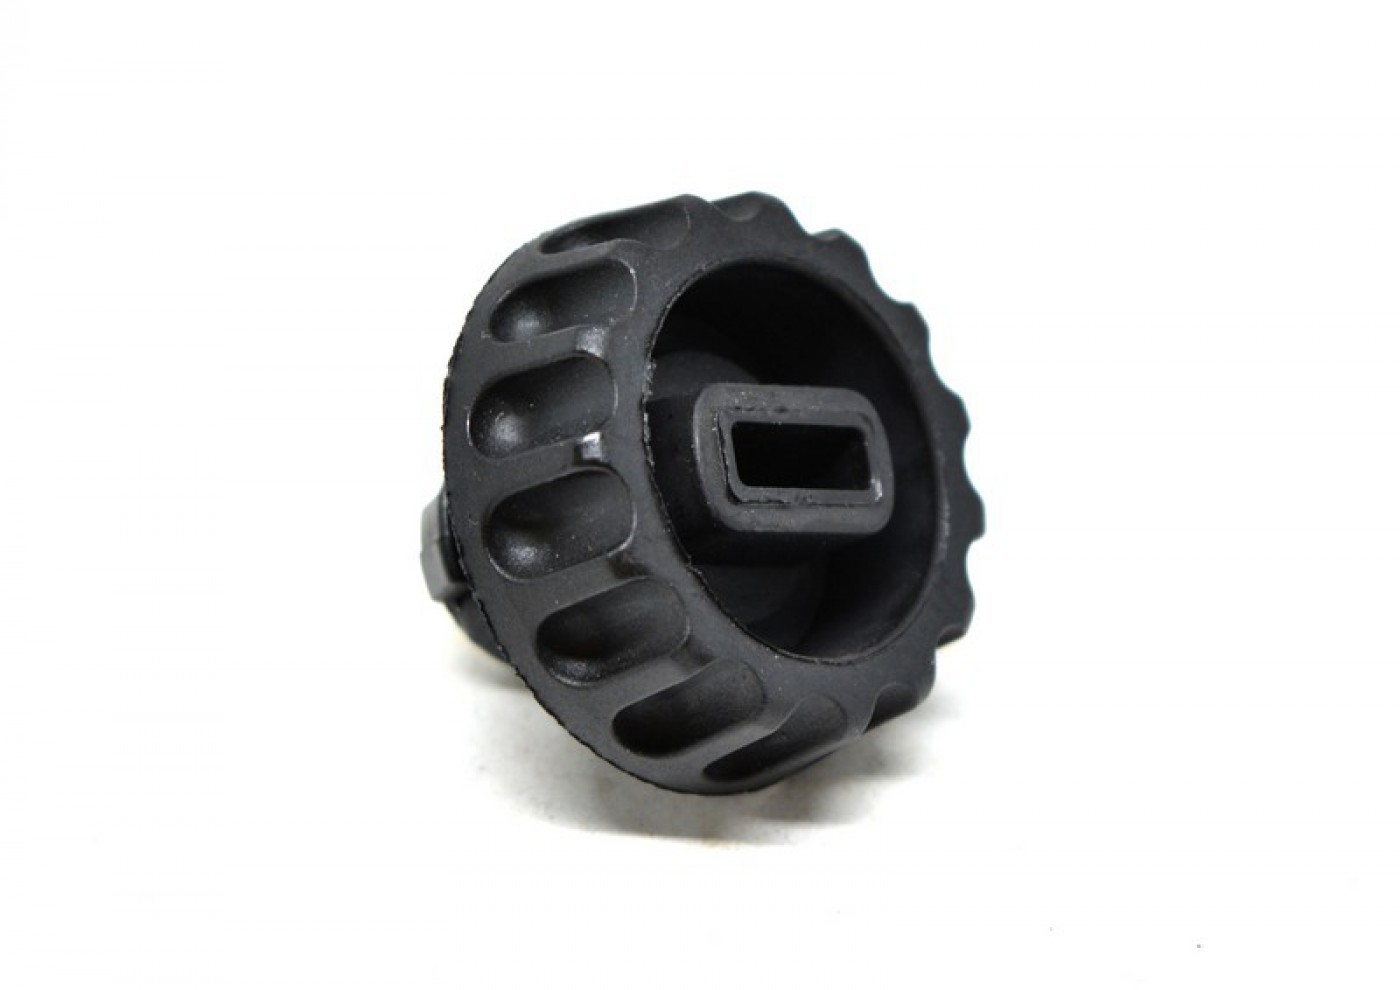 Zátka krytu vzduchového filtru Stihl MS361 MS341